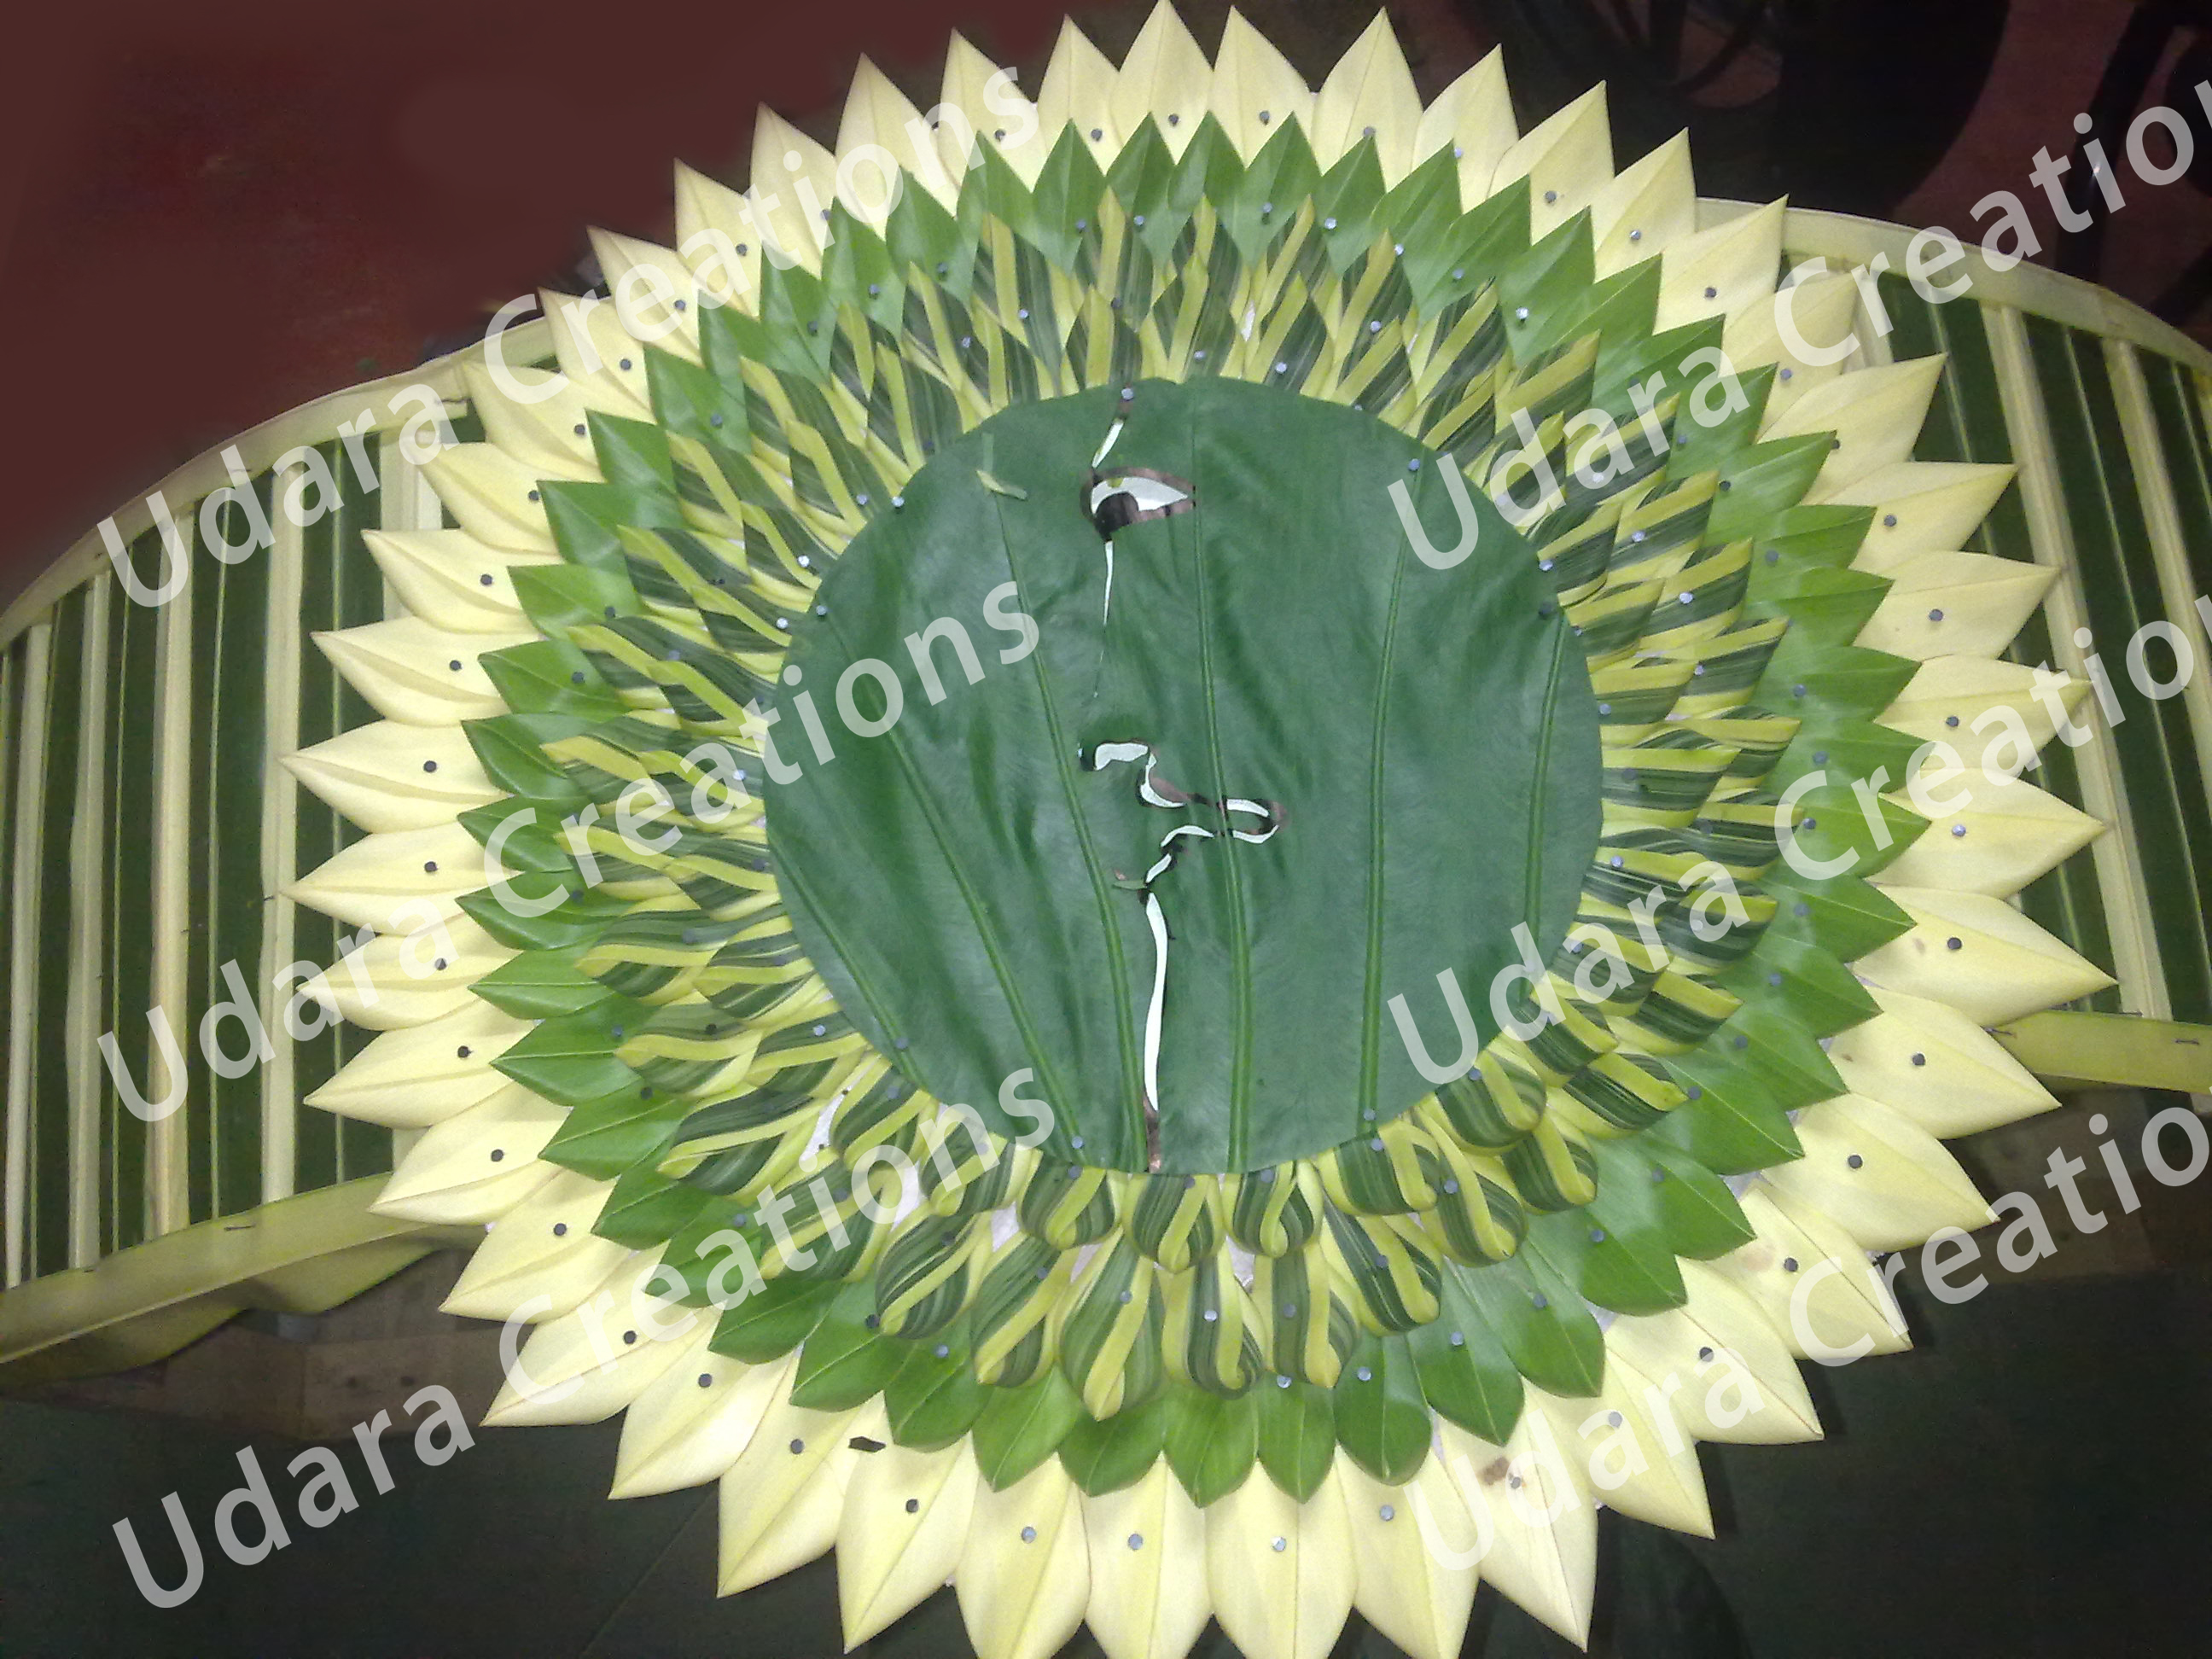 Poruwa 3rd  Udara Creations